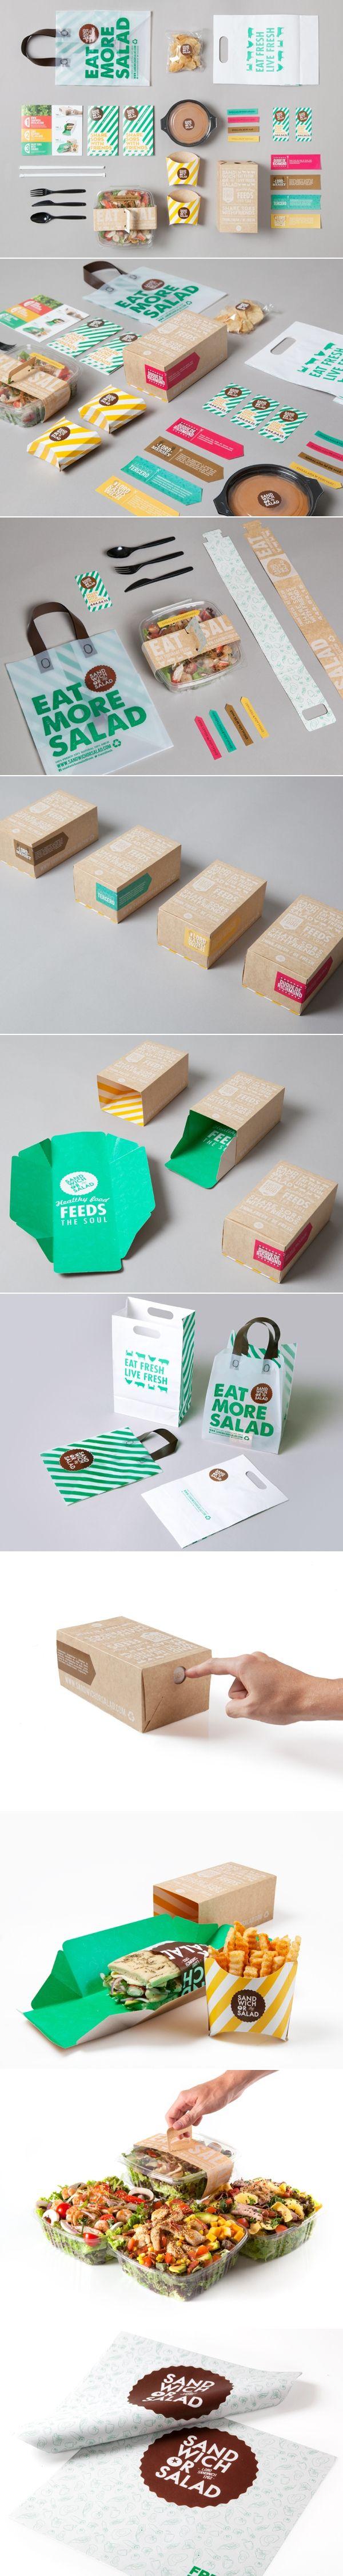 http://www.brandingserved.com/gallery/Sandwich-or-Salad/7446721